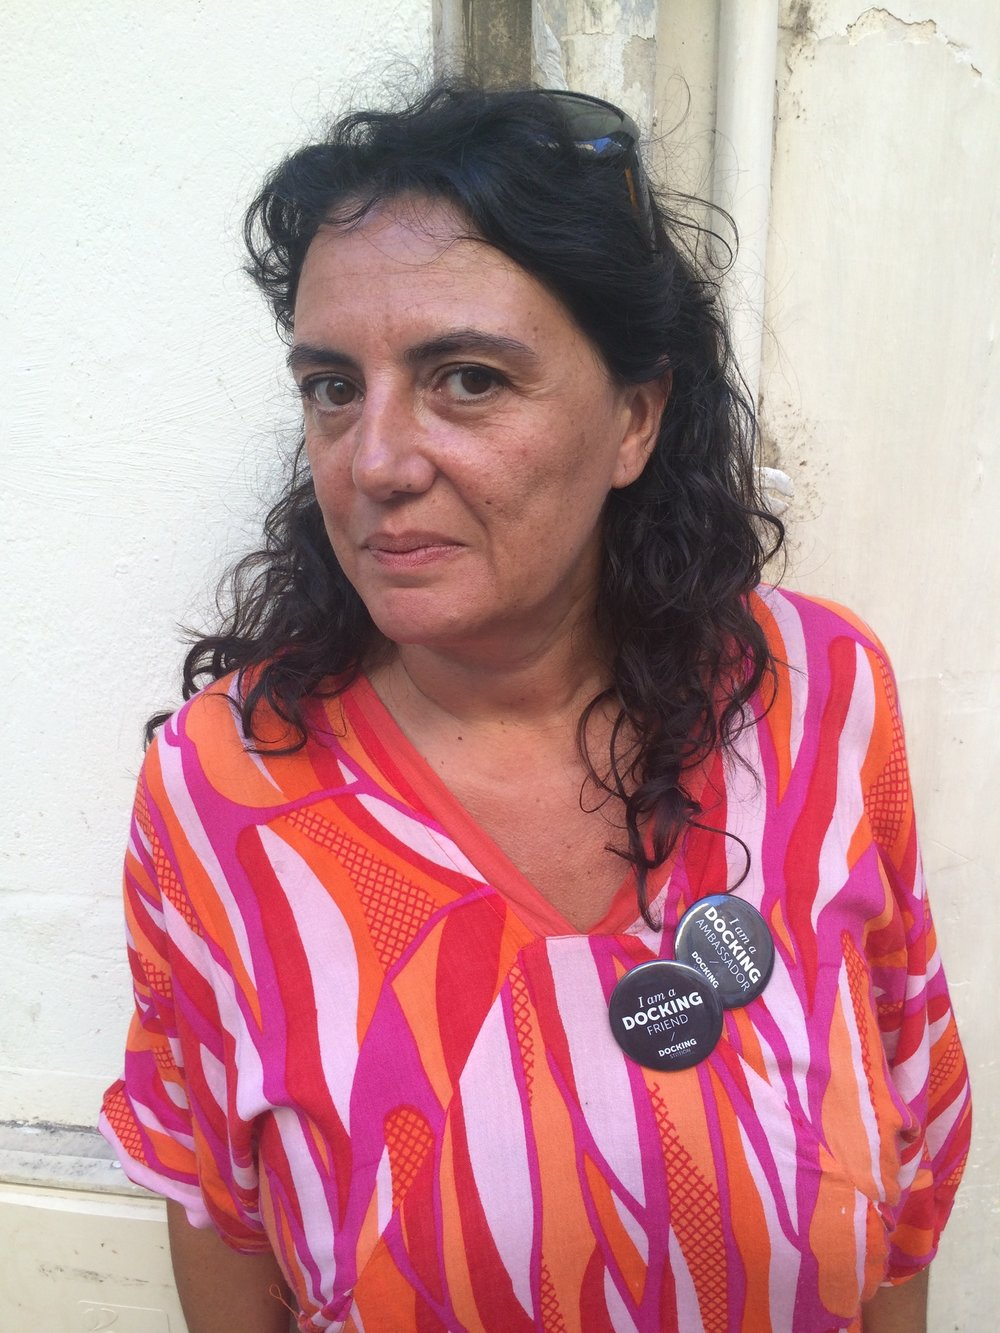 Nathalie Belayhe